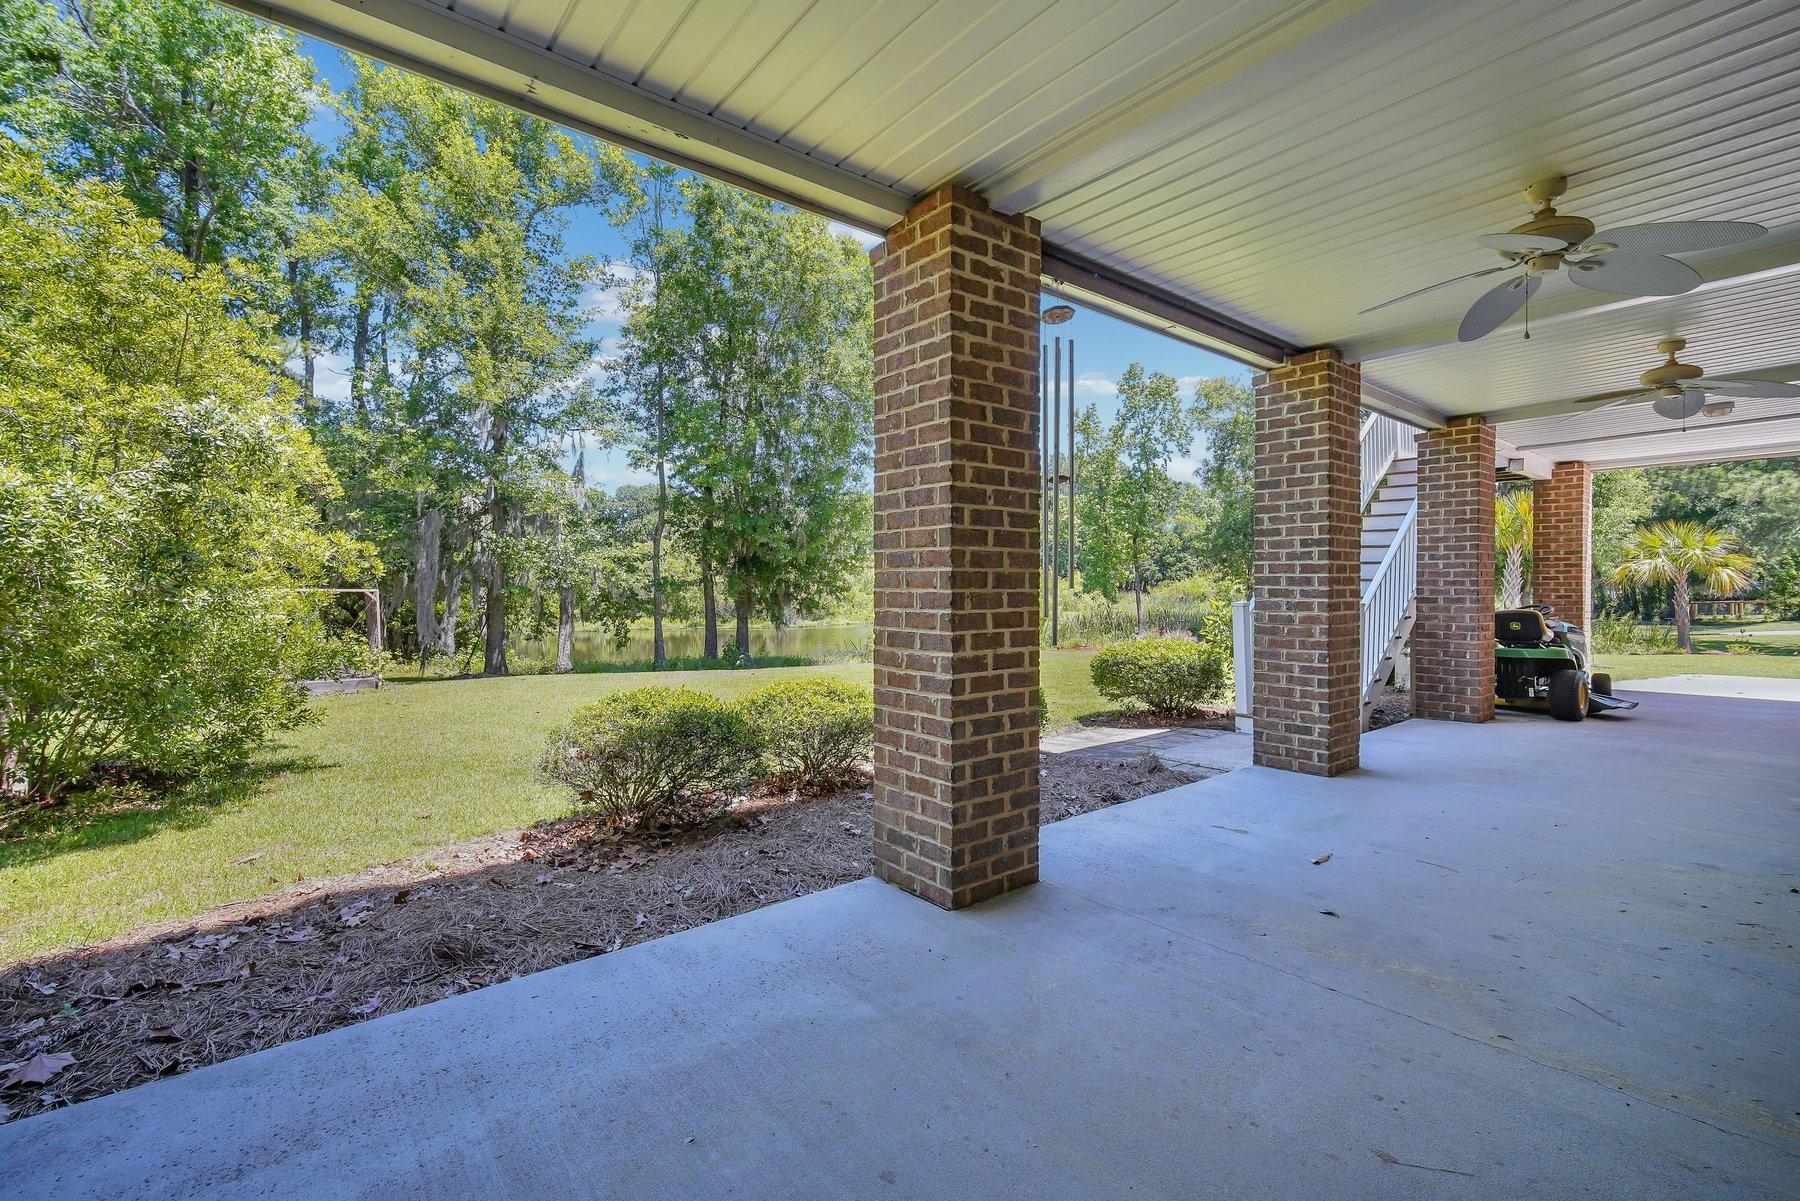 310 Archibald Drive Goose Creek, SC 29445